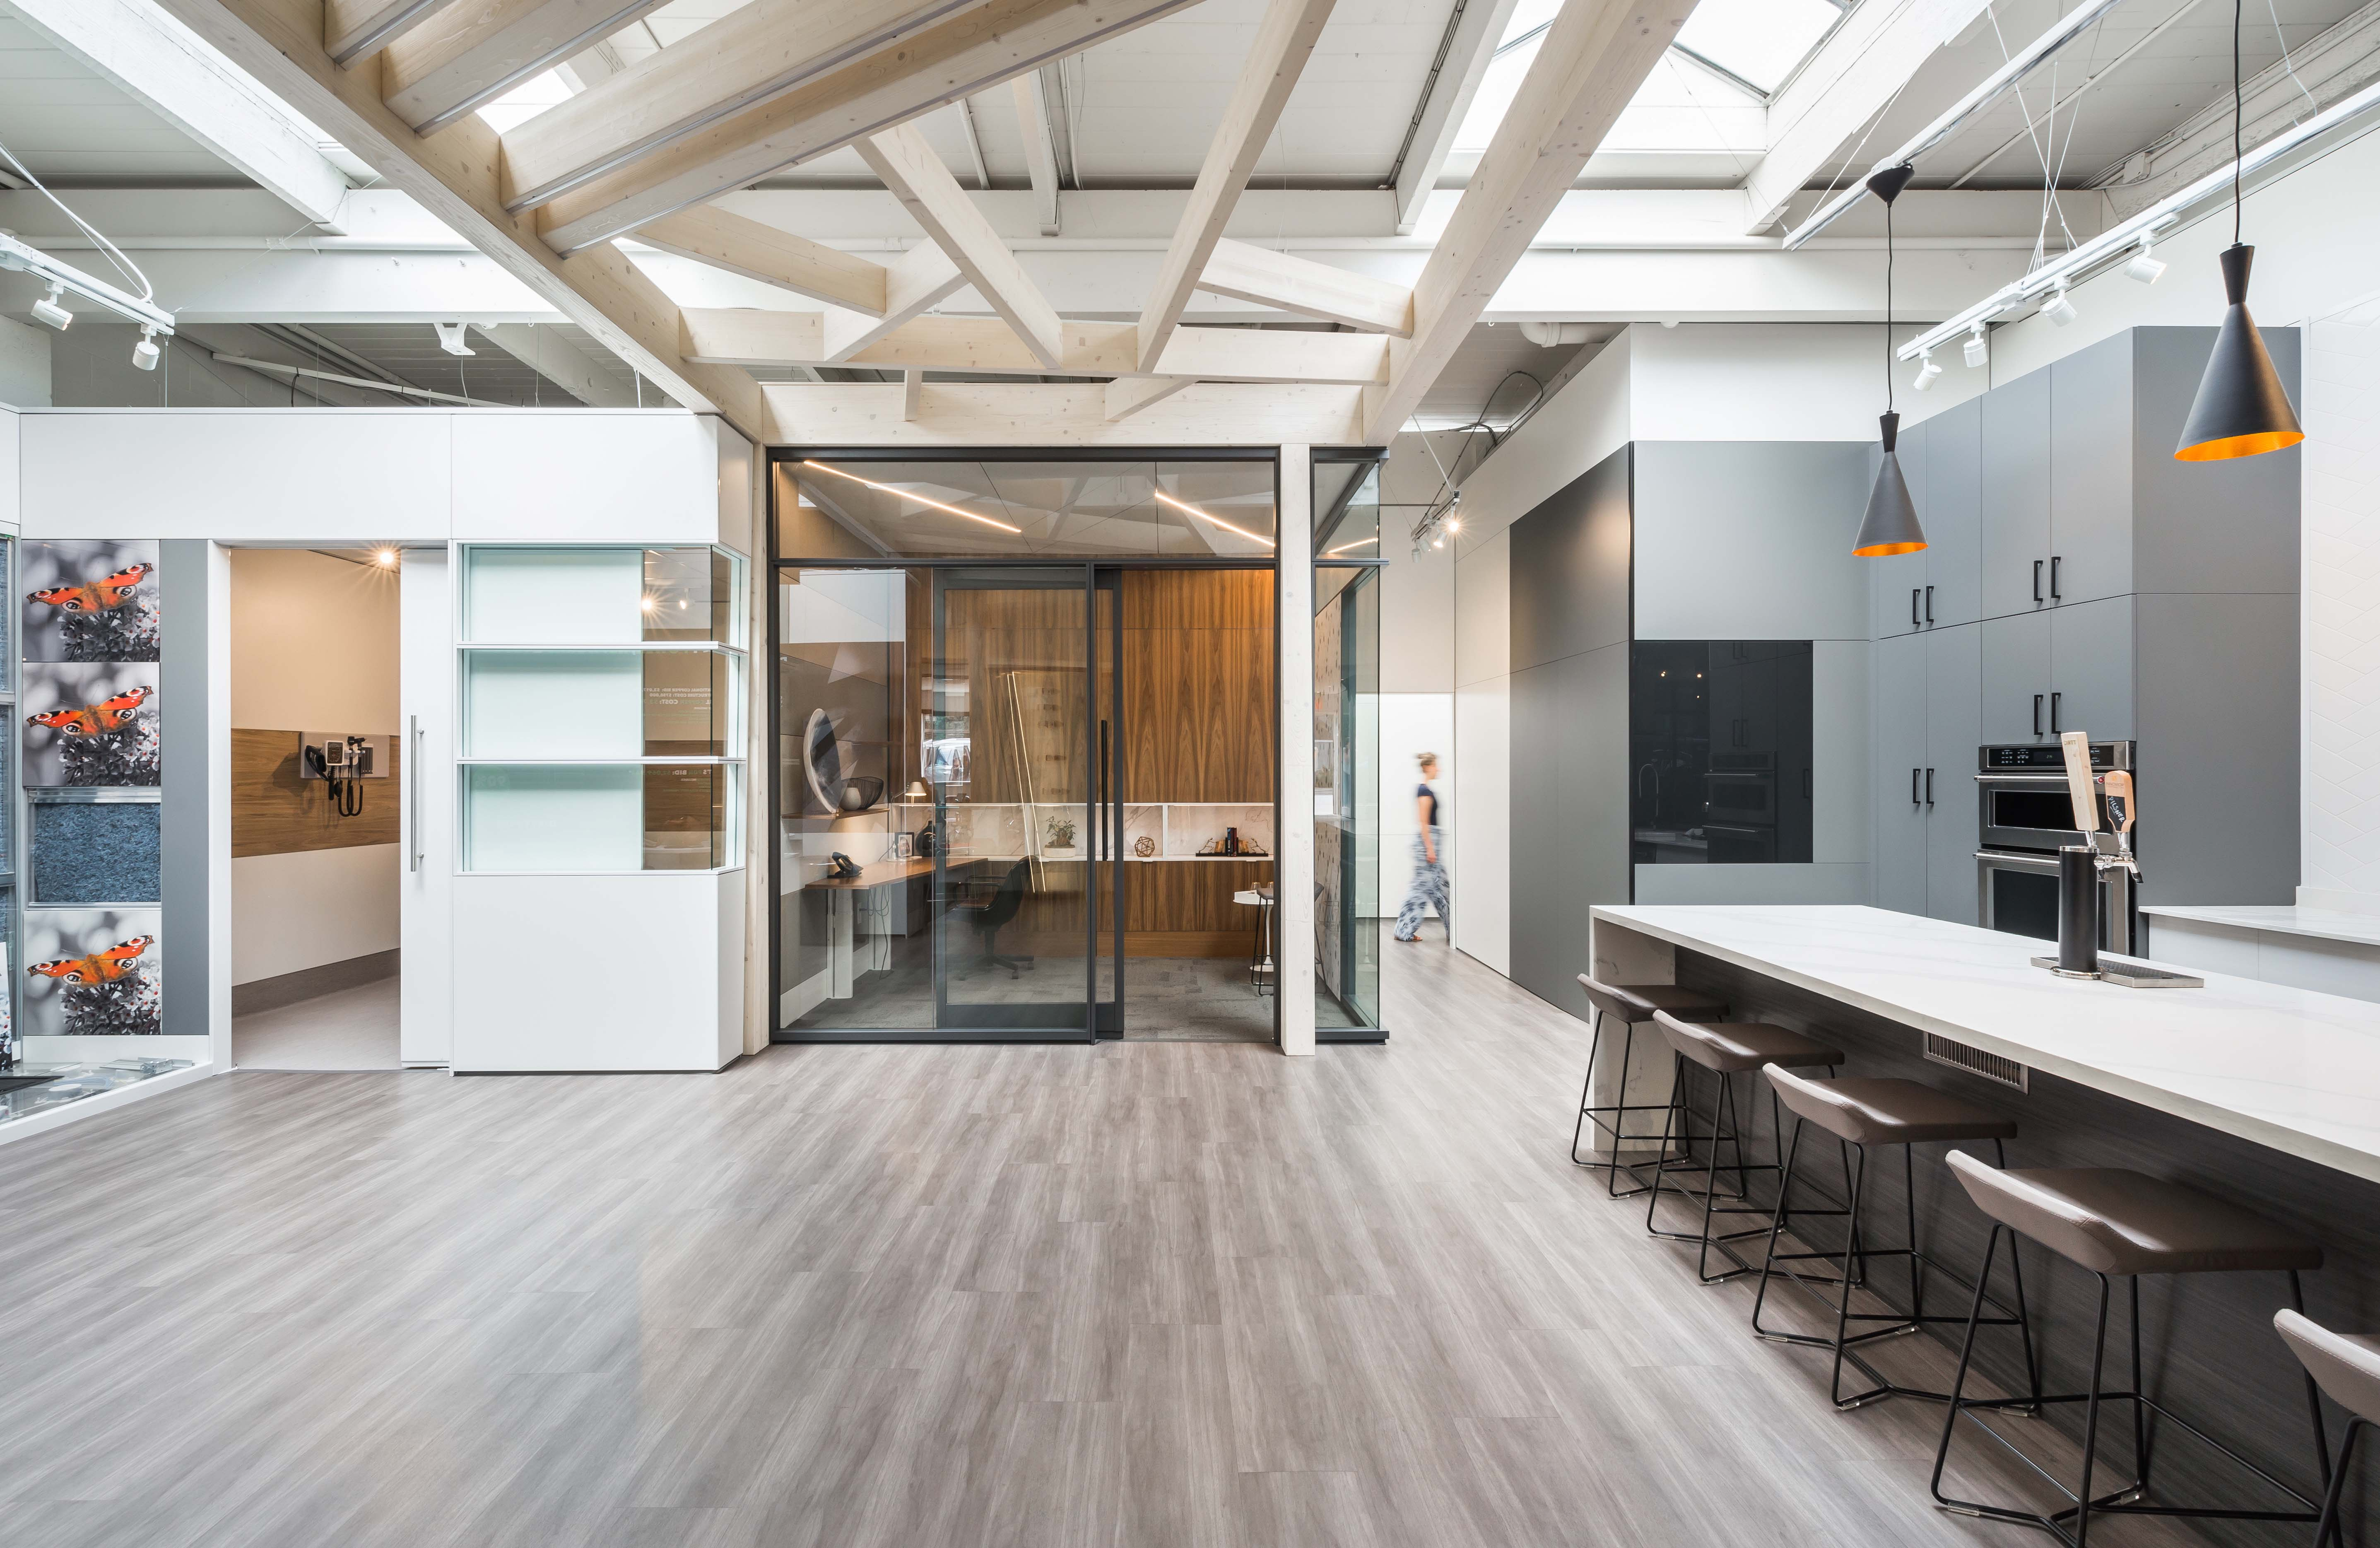 Best Interior Design Company Toronto, Vancouver, Halifax